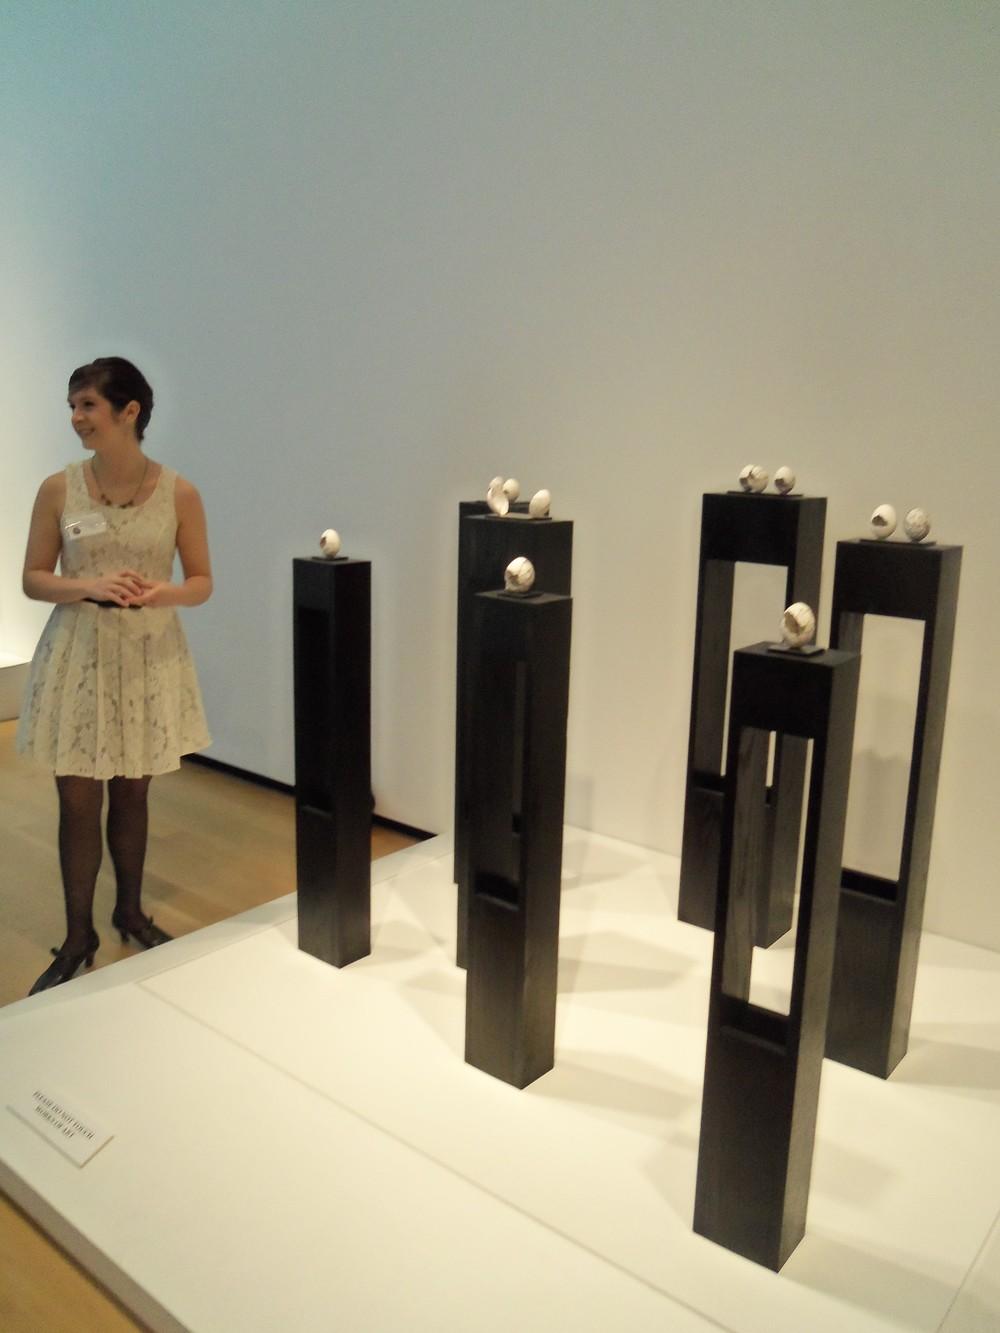 Artist & 2012 Series at GRAM